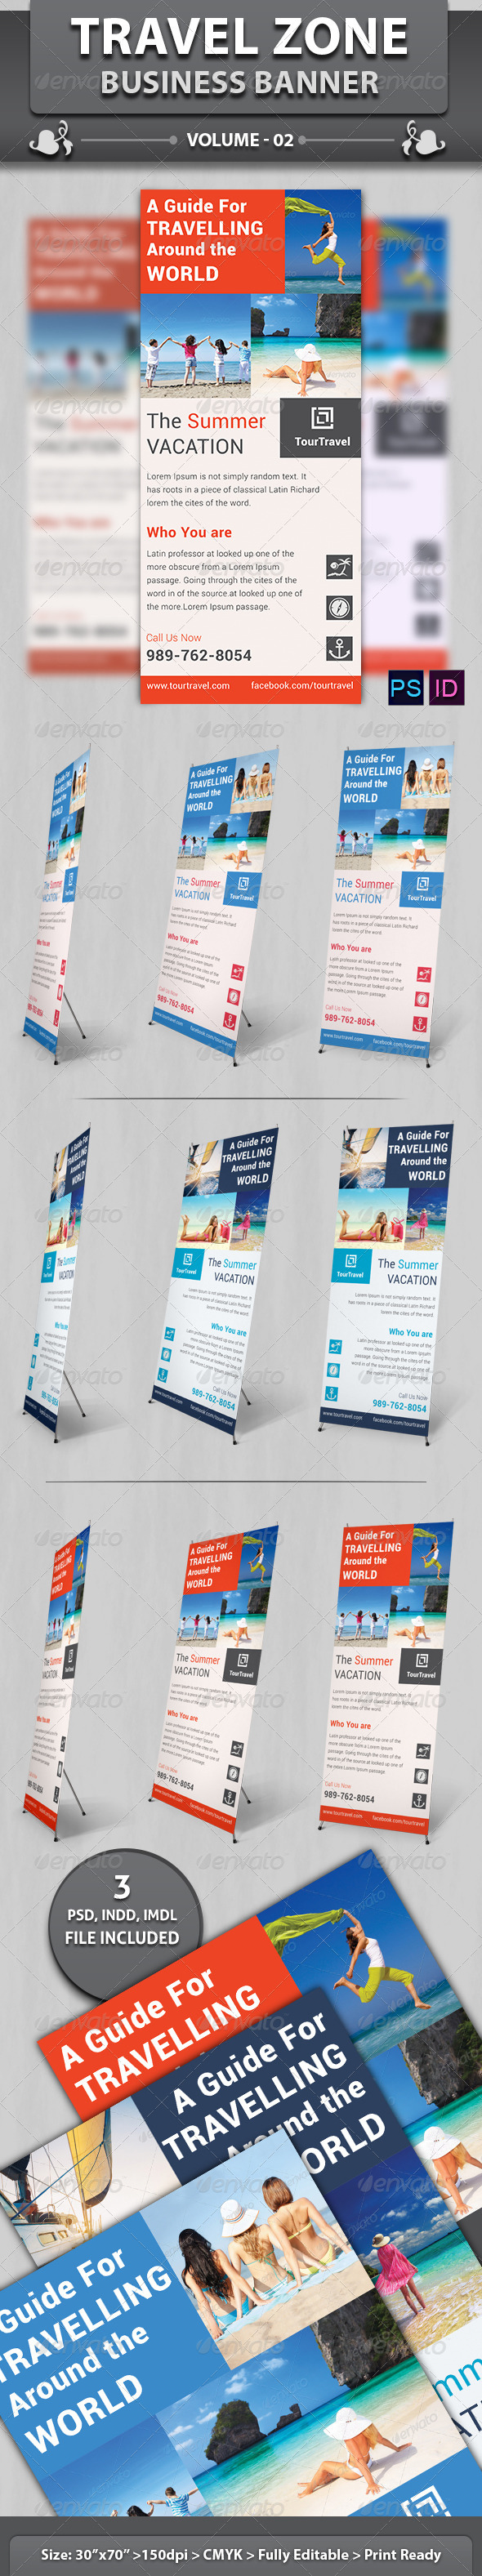 Travel Touriasm Business Banner Volume 2